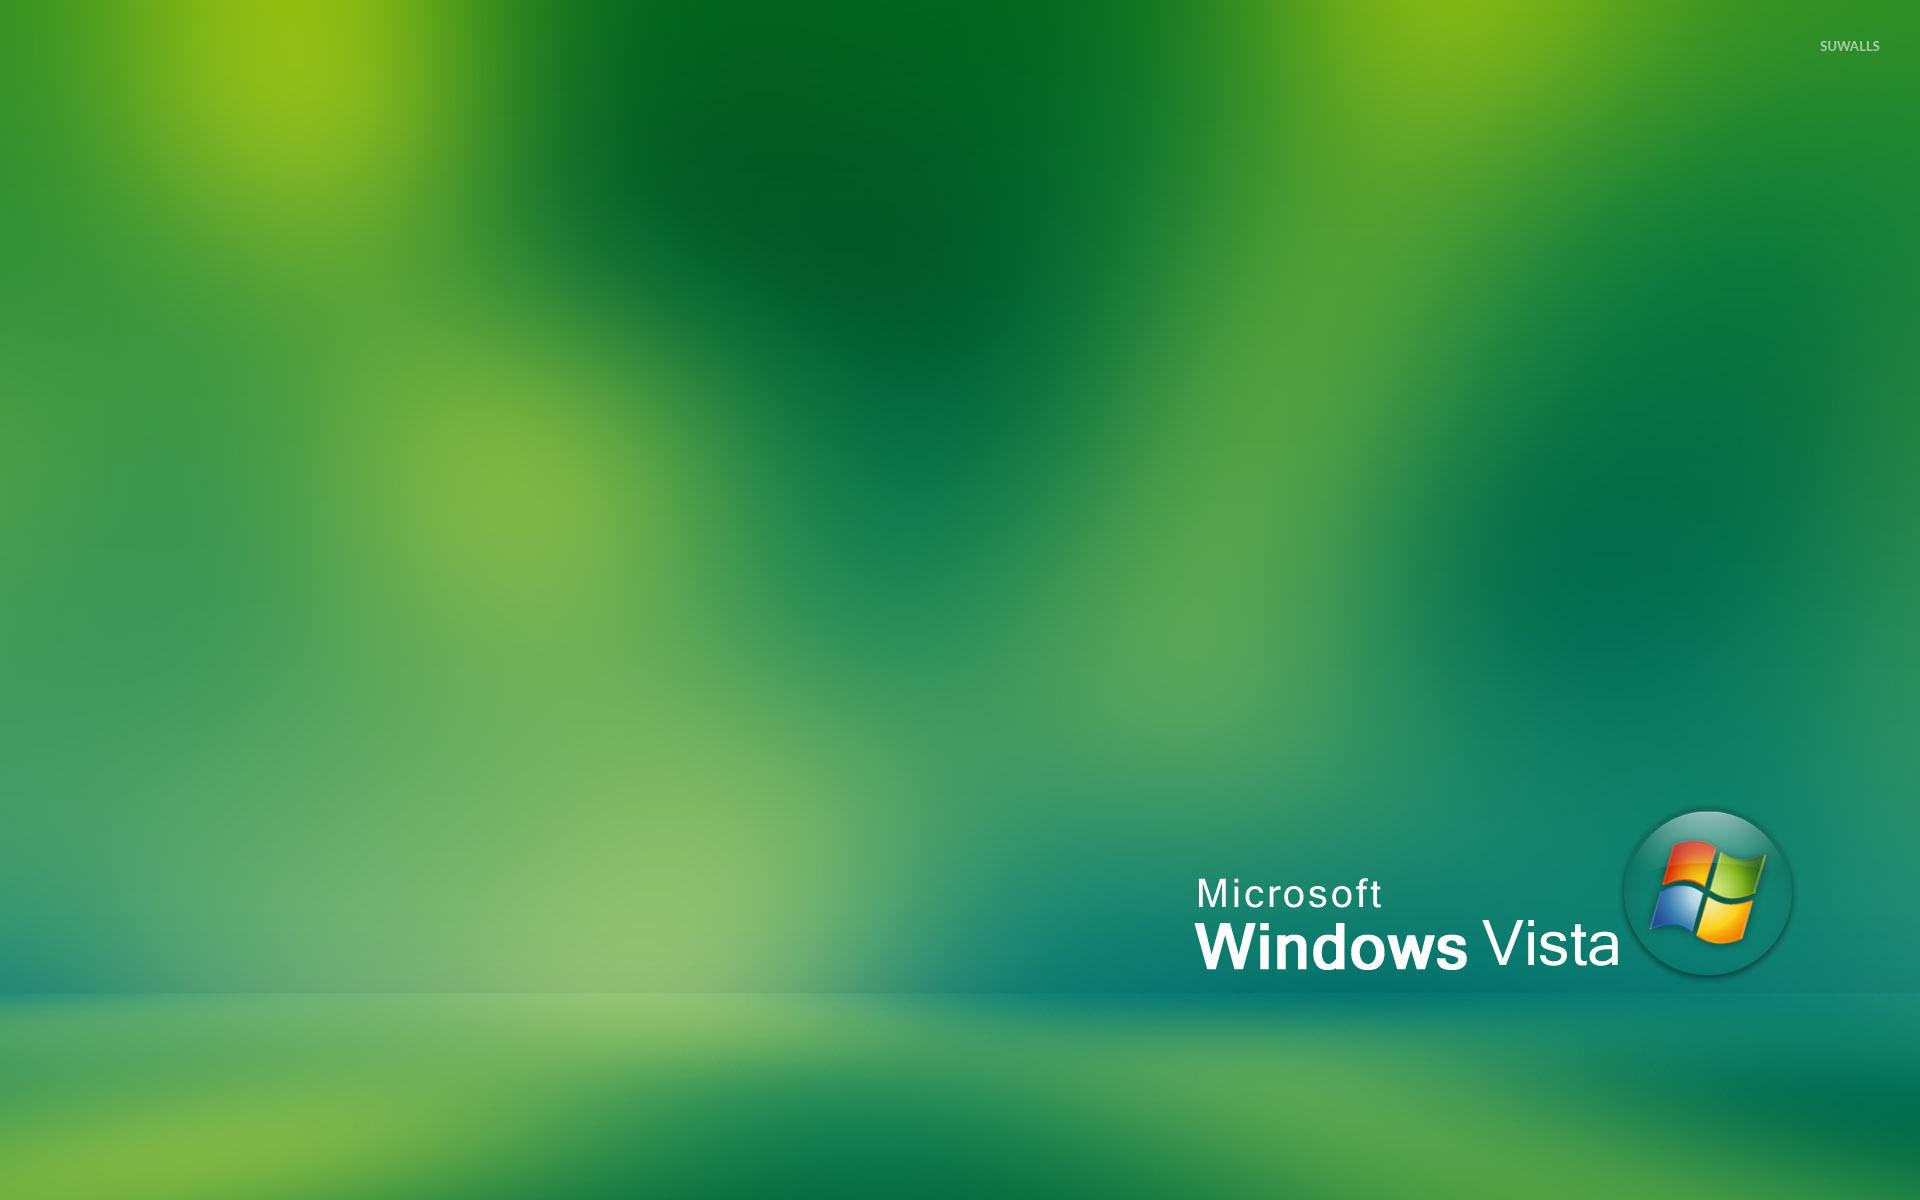 Windows Vista 4 Wallpaper